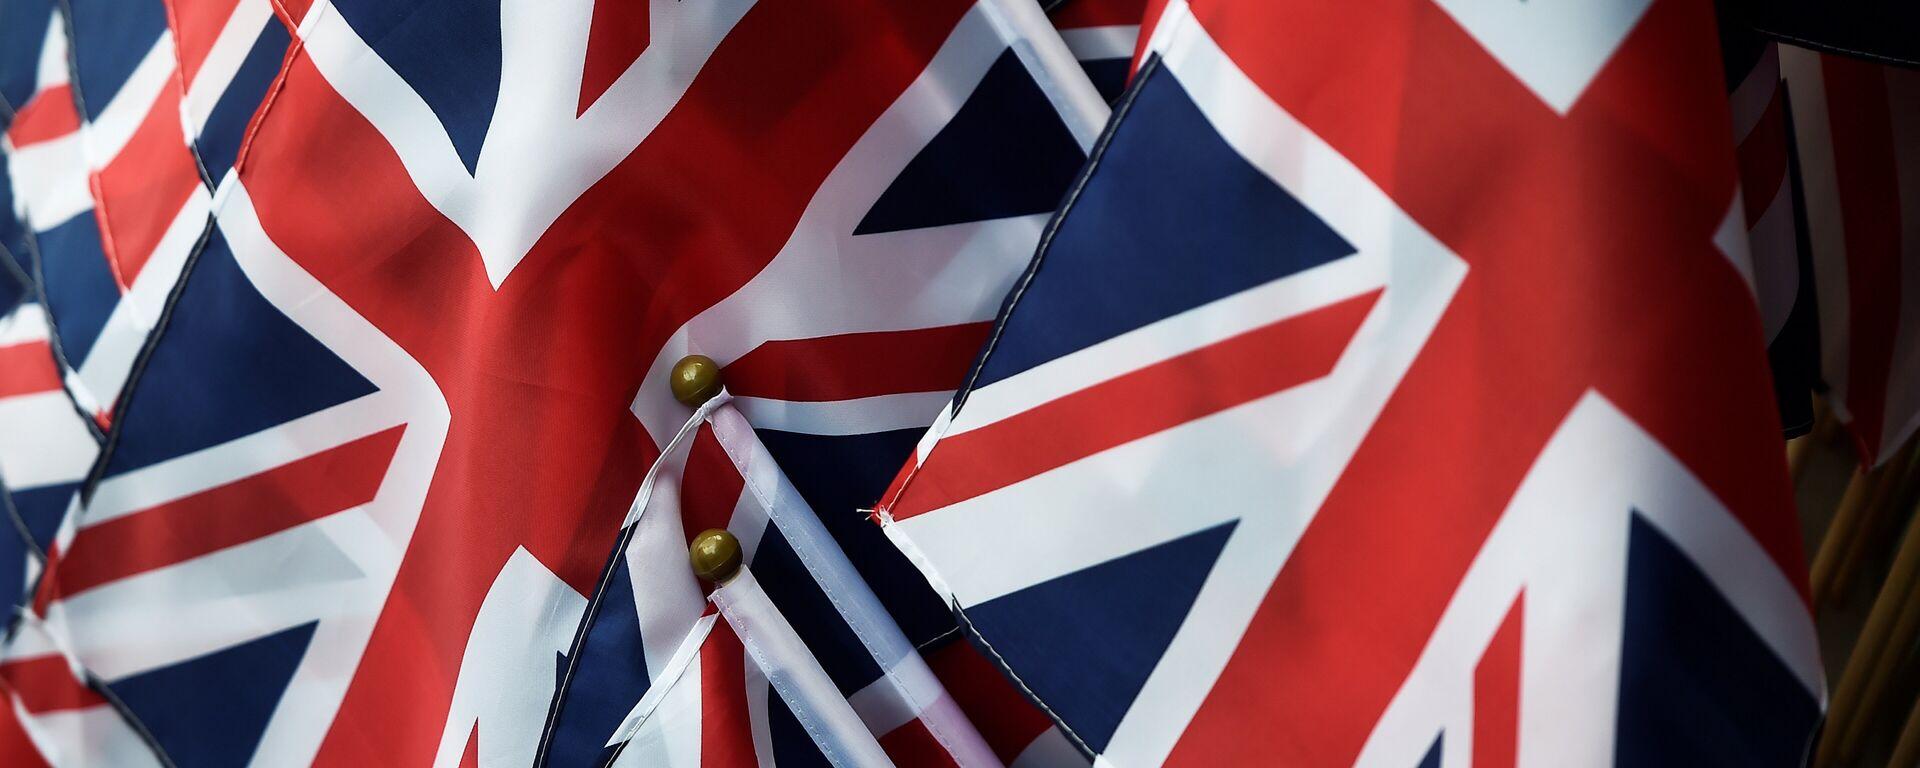 Las banderas del Reino Unido - Sputnik Mundo, 1920, 01.02.2021